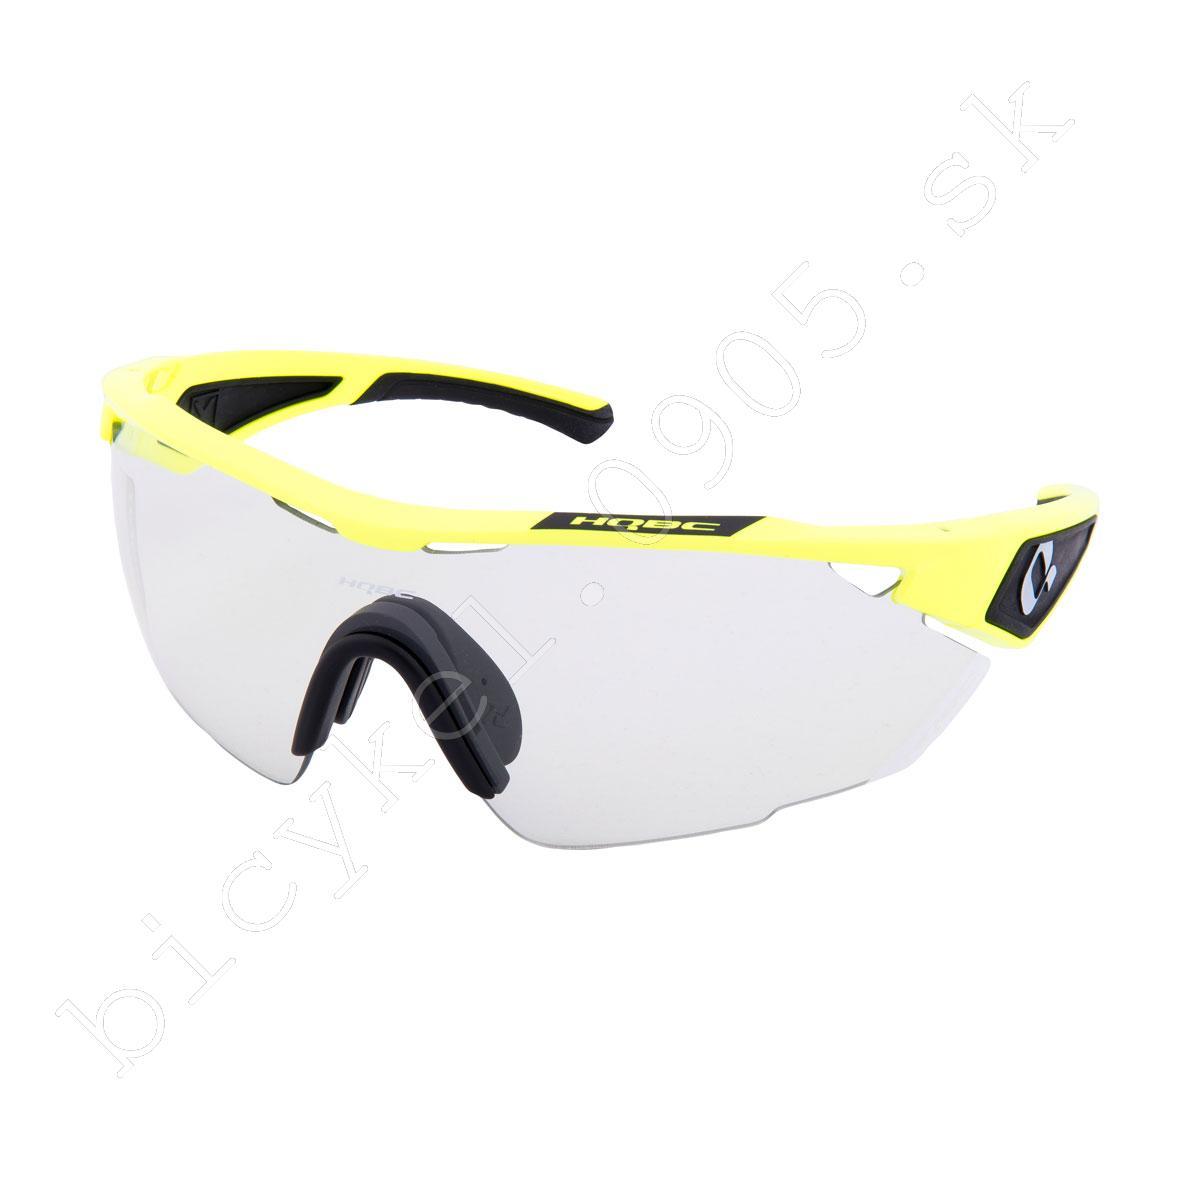 4291b0338 bicykel,bicykle Okuliare QX3 Fluo žltá Photochromic Výbava jazdca ...